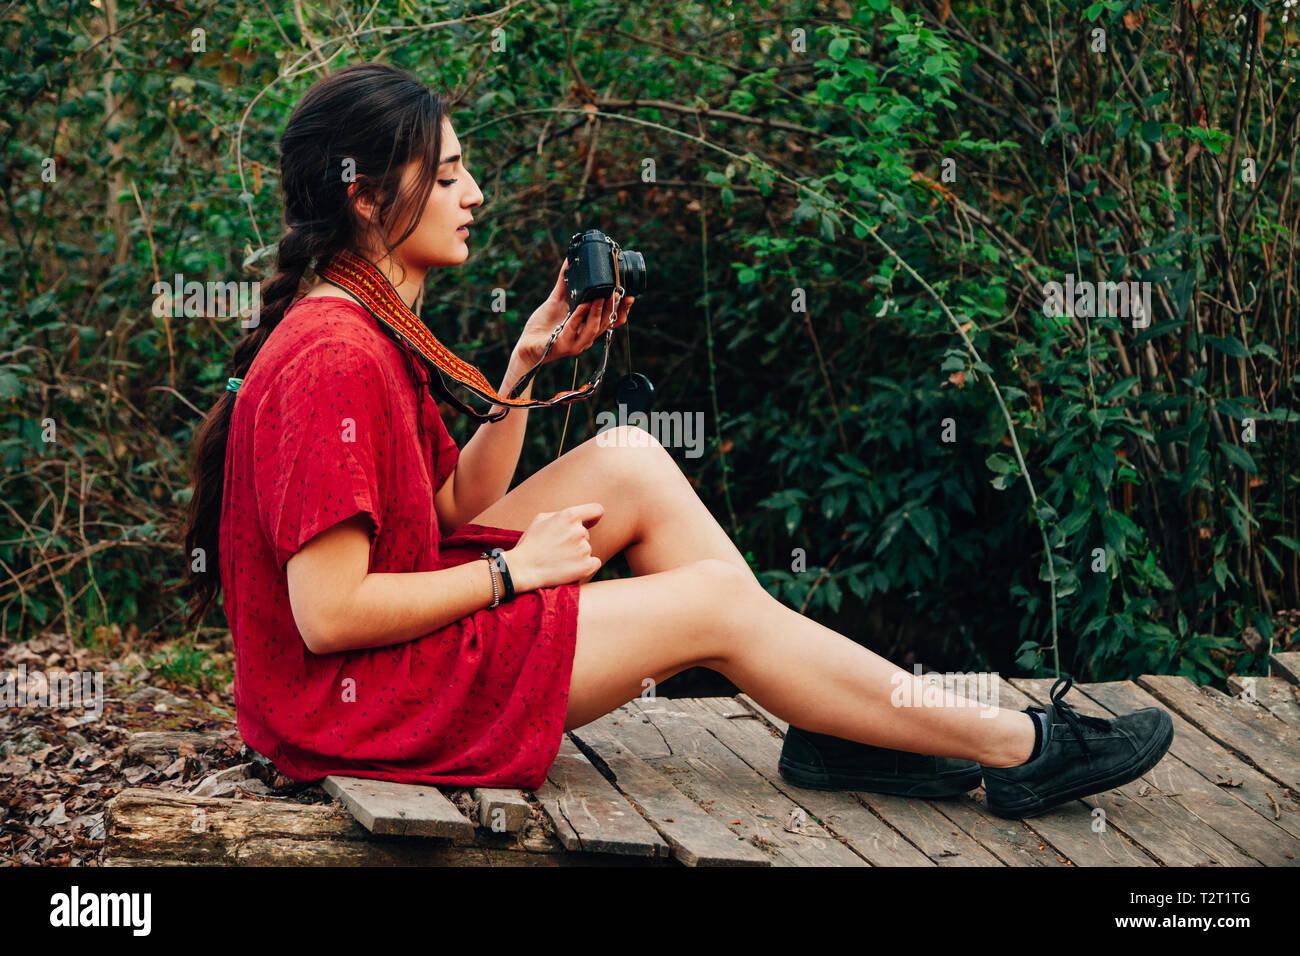 c30541542 Mini Vestido Imágenes De Stock & Mini Vestido Fotos De Stock - Alamy